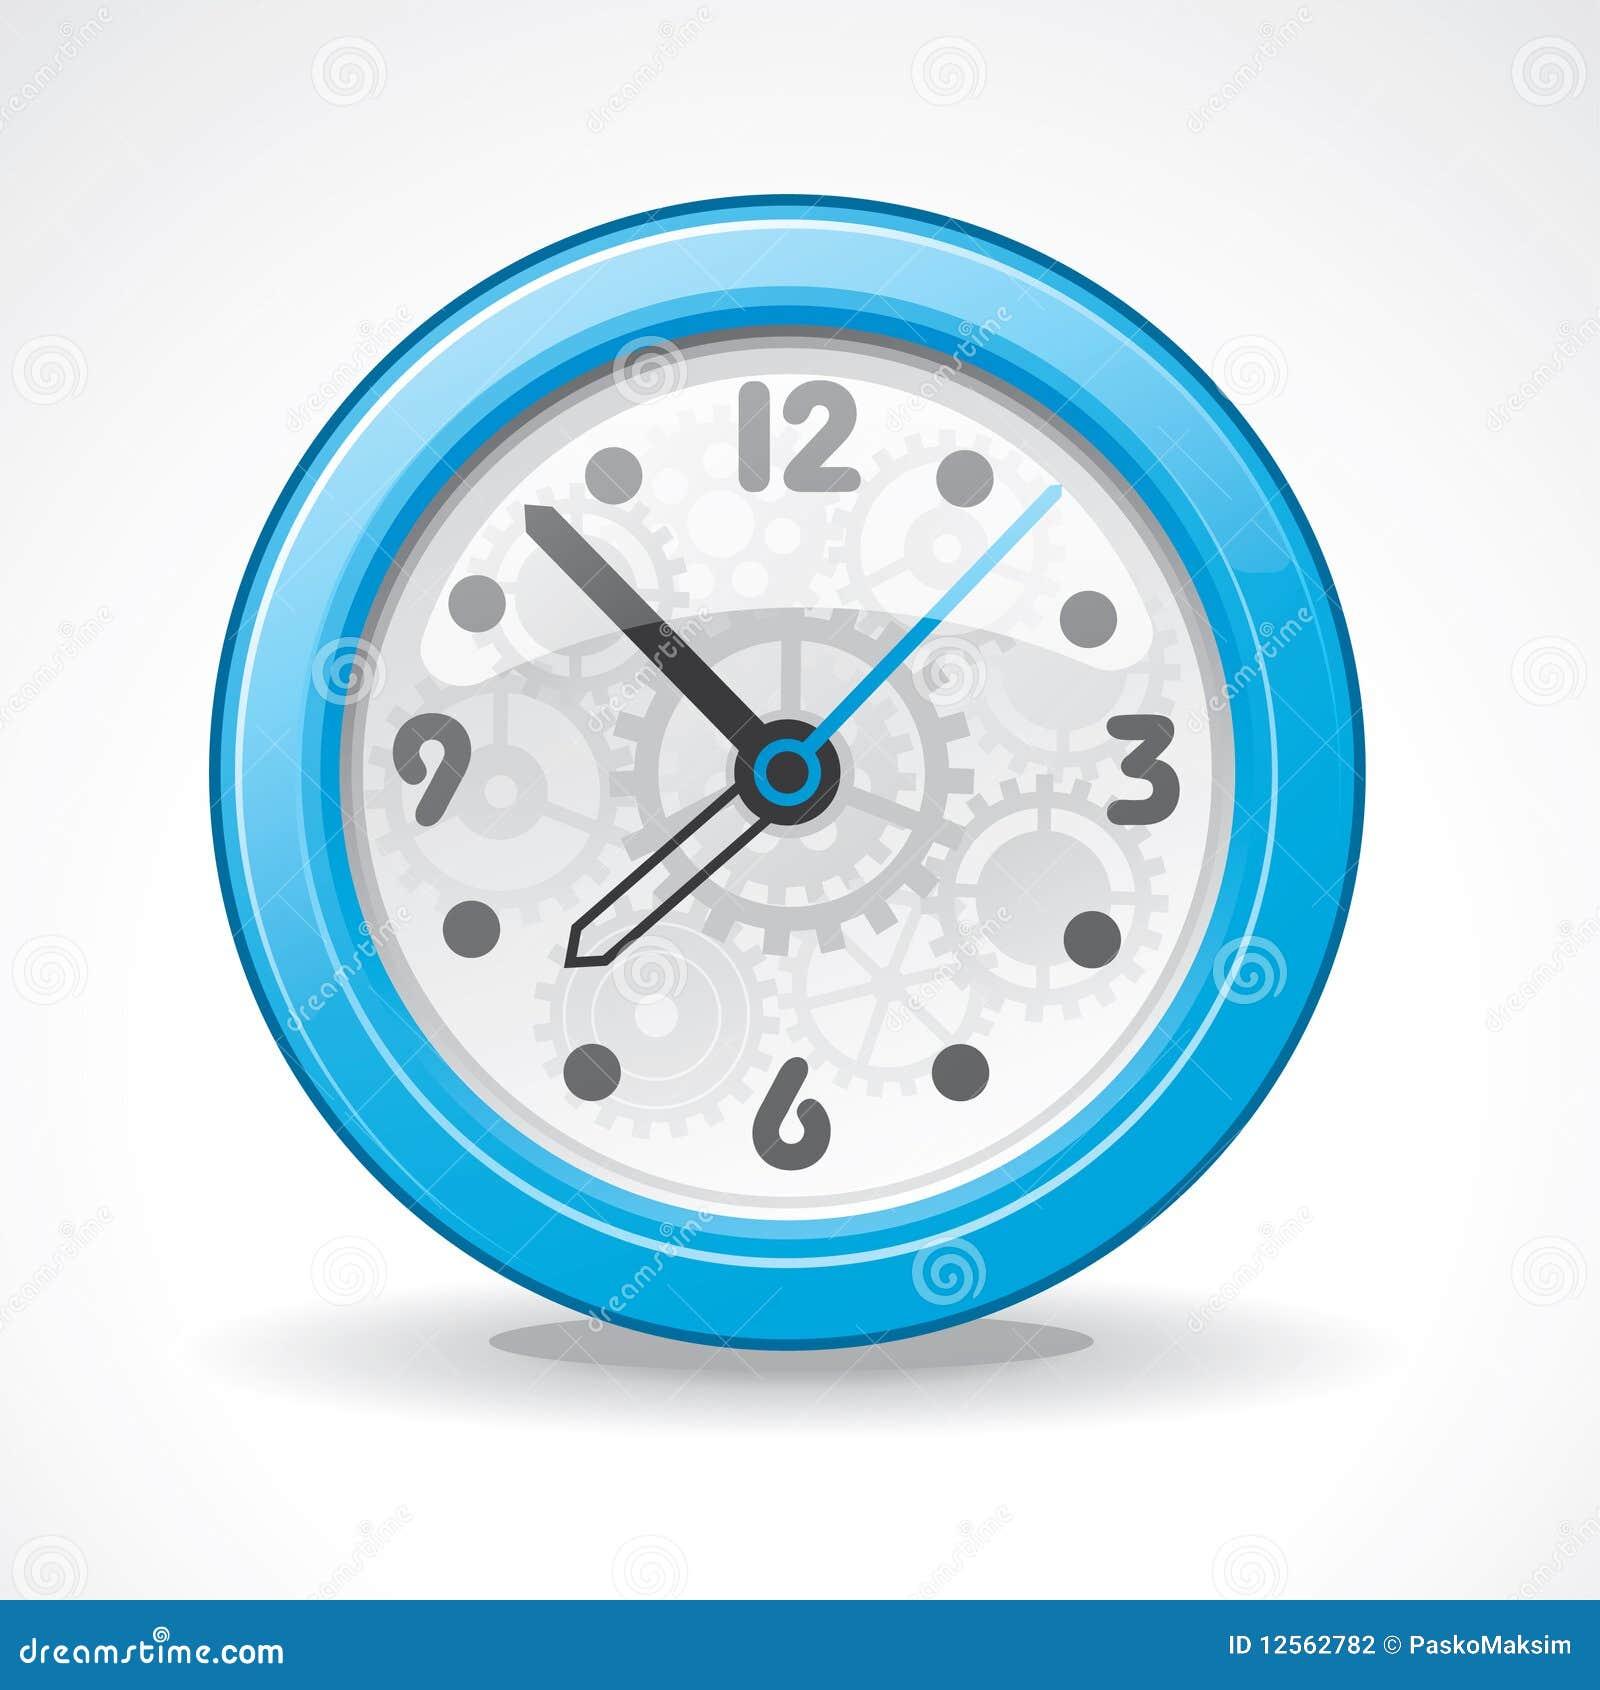 Reloj moderno transparente ilustraci n del vector imagen de visualizaci n 12562782 - Relojes de salon modernos ...